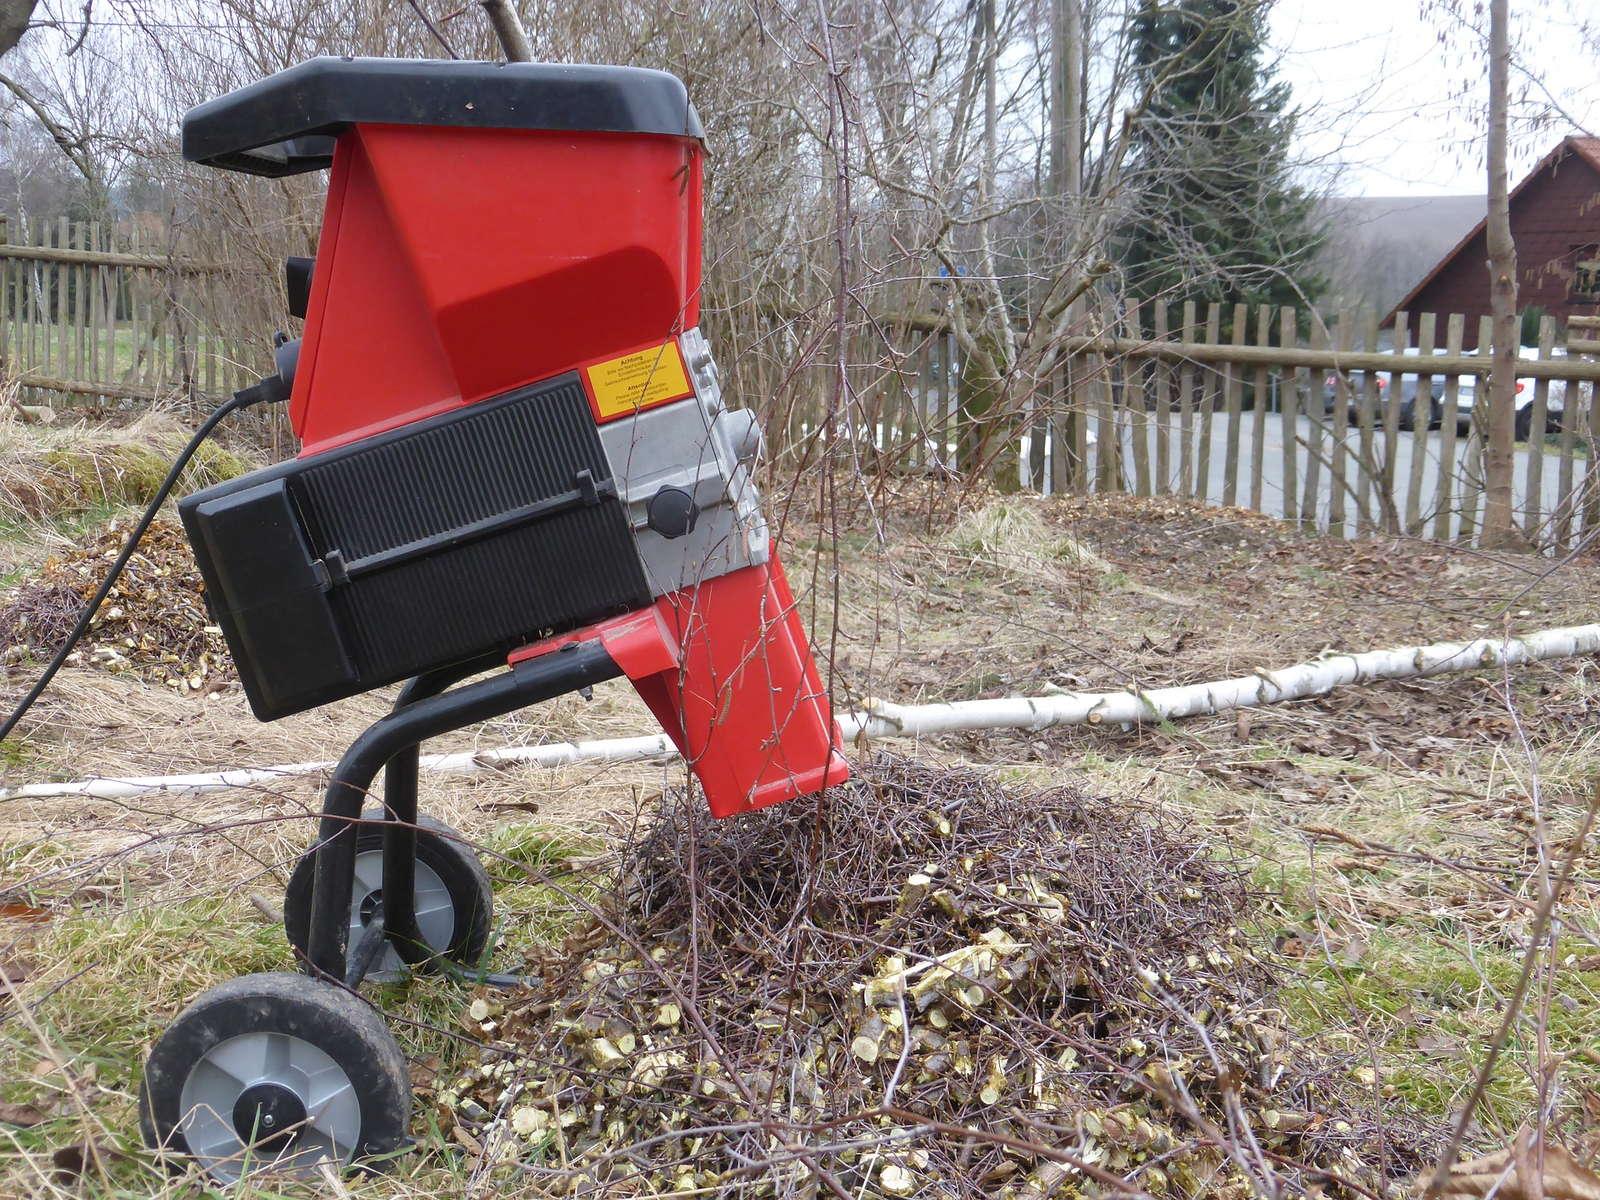 Schön Gartenhäcksler Im Garten